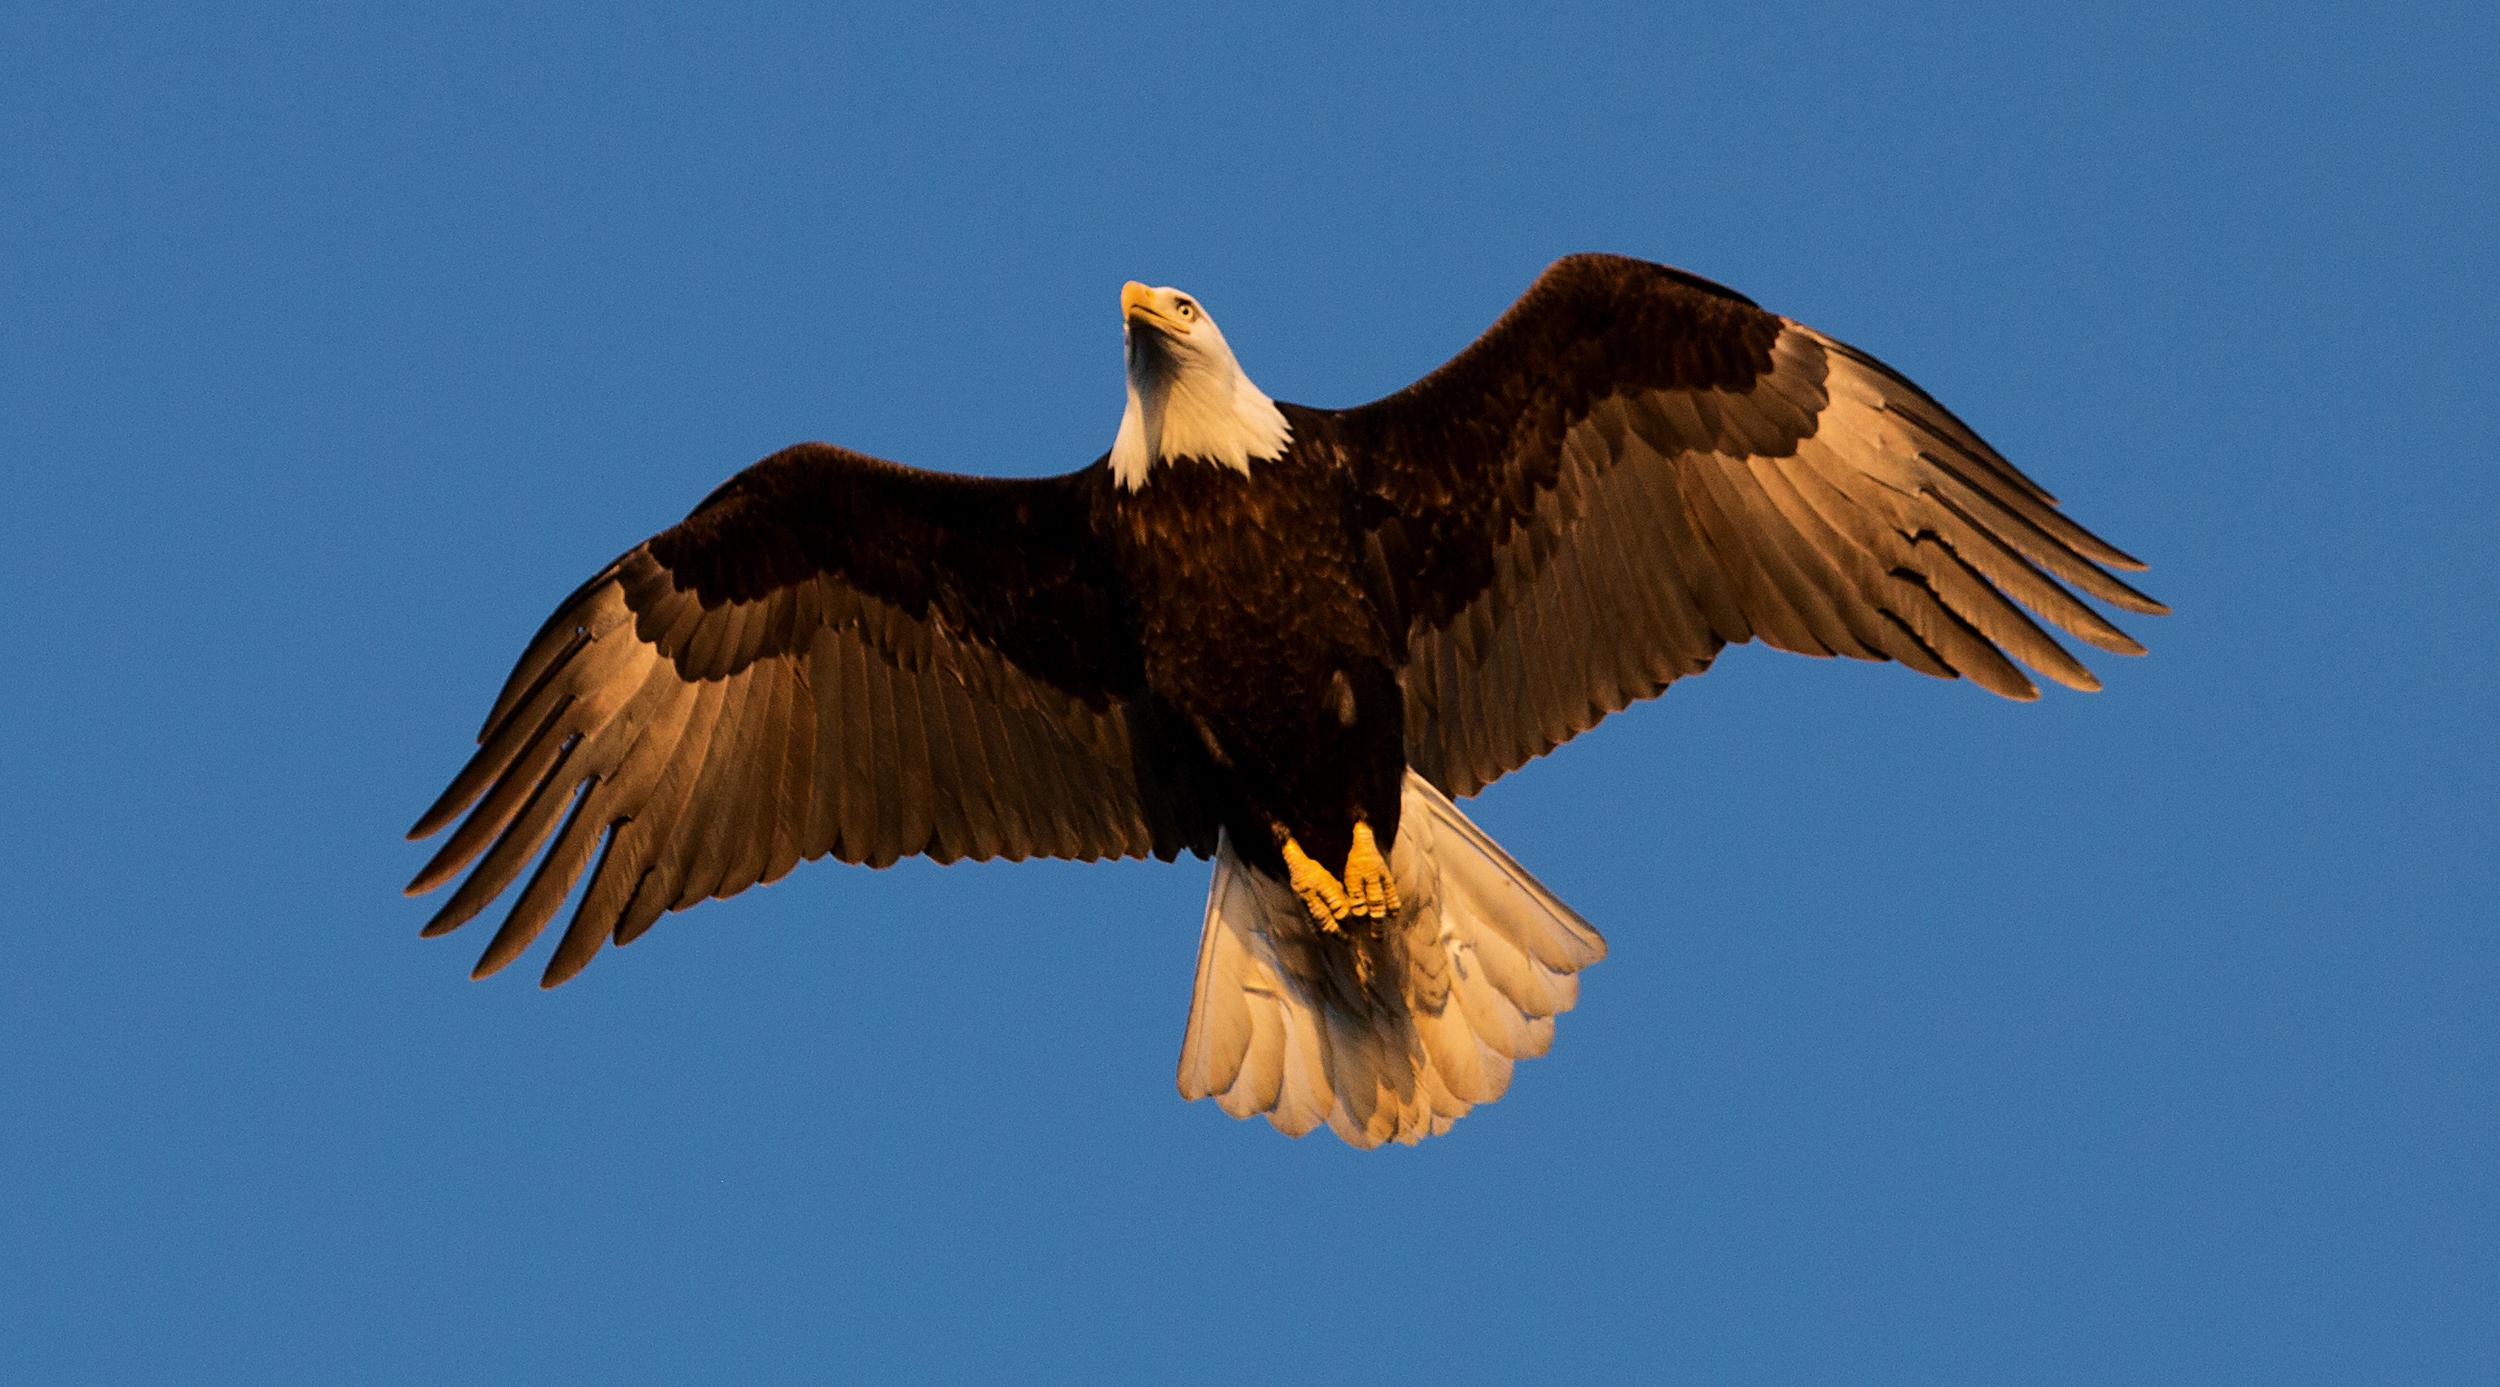 Rick Sammon's Birds027.jpg